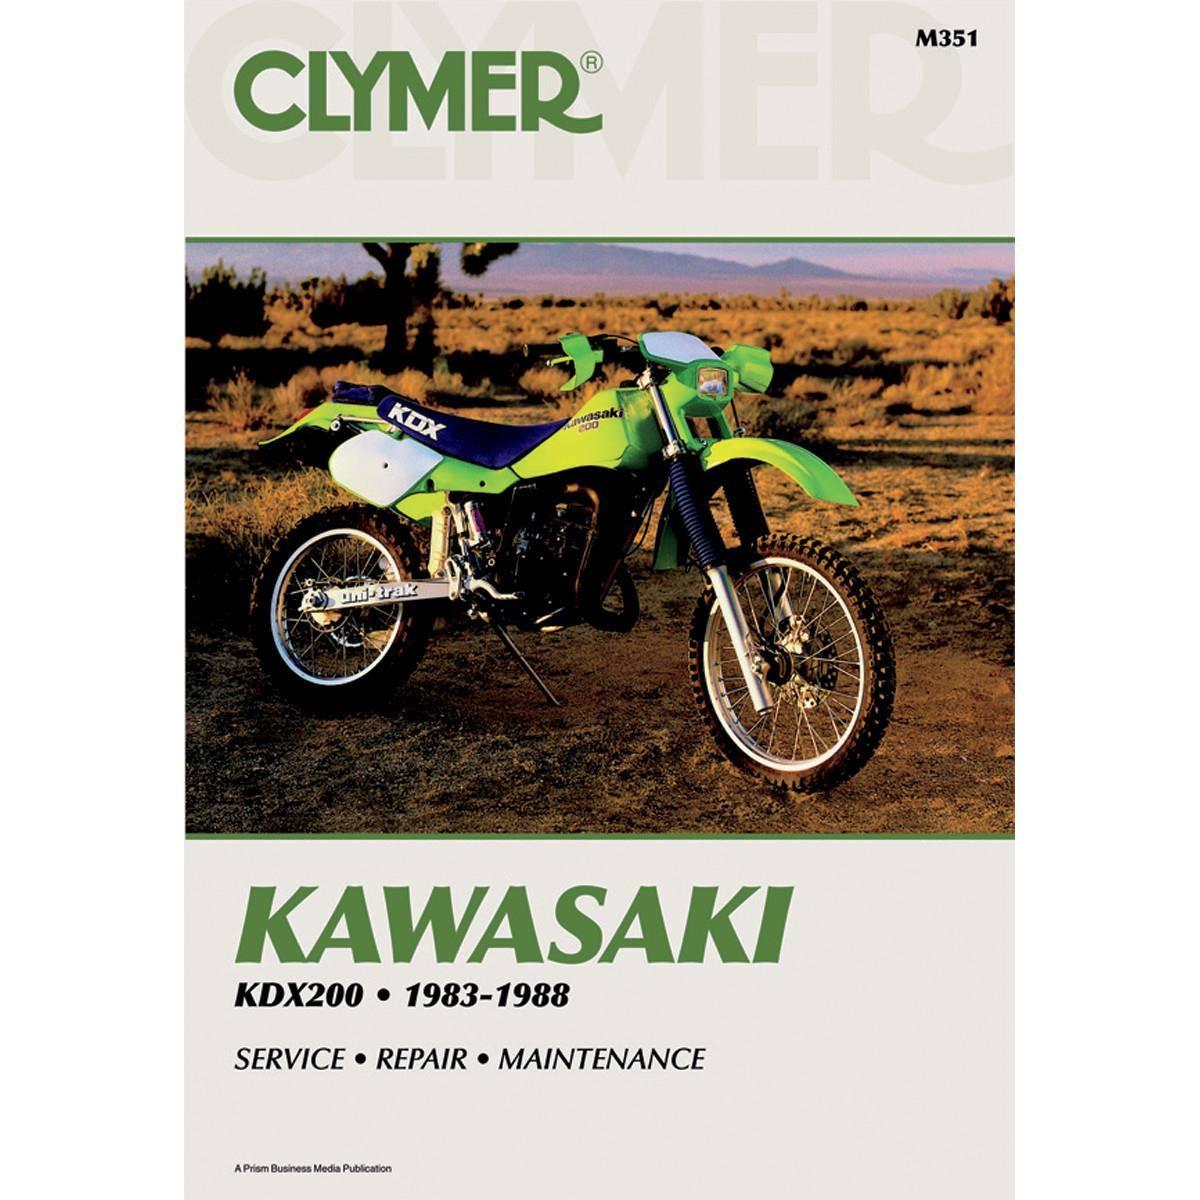 ... Array - repair manual for sale in southington ct al joy tire service  860 rh aljoytire